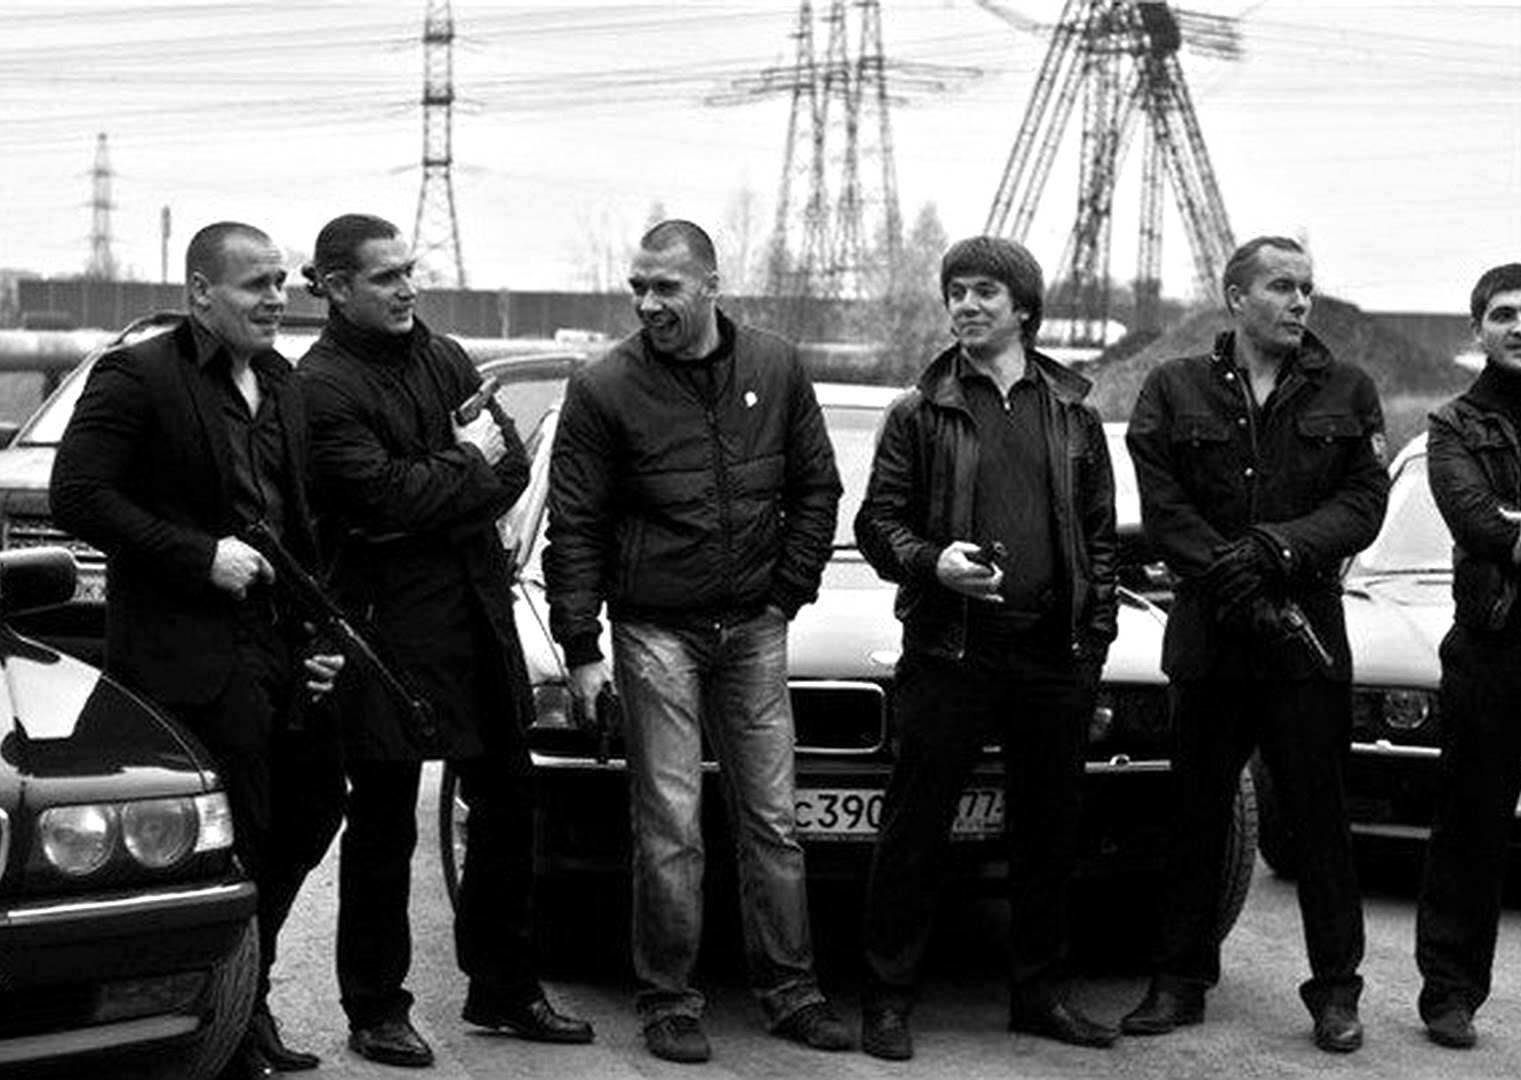 Братки, бандиты, девяностые